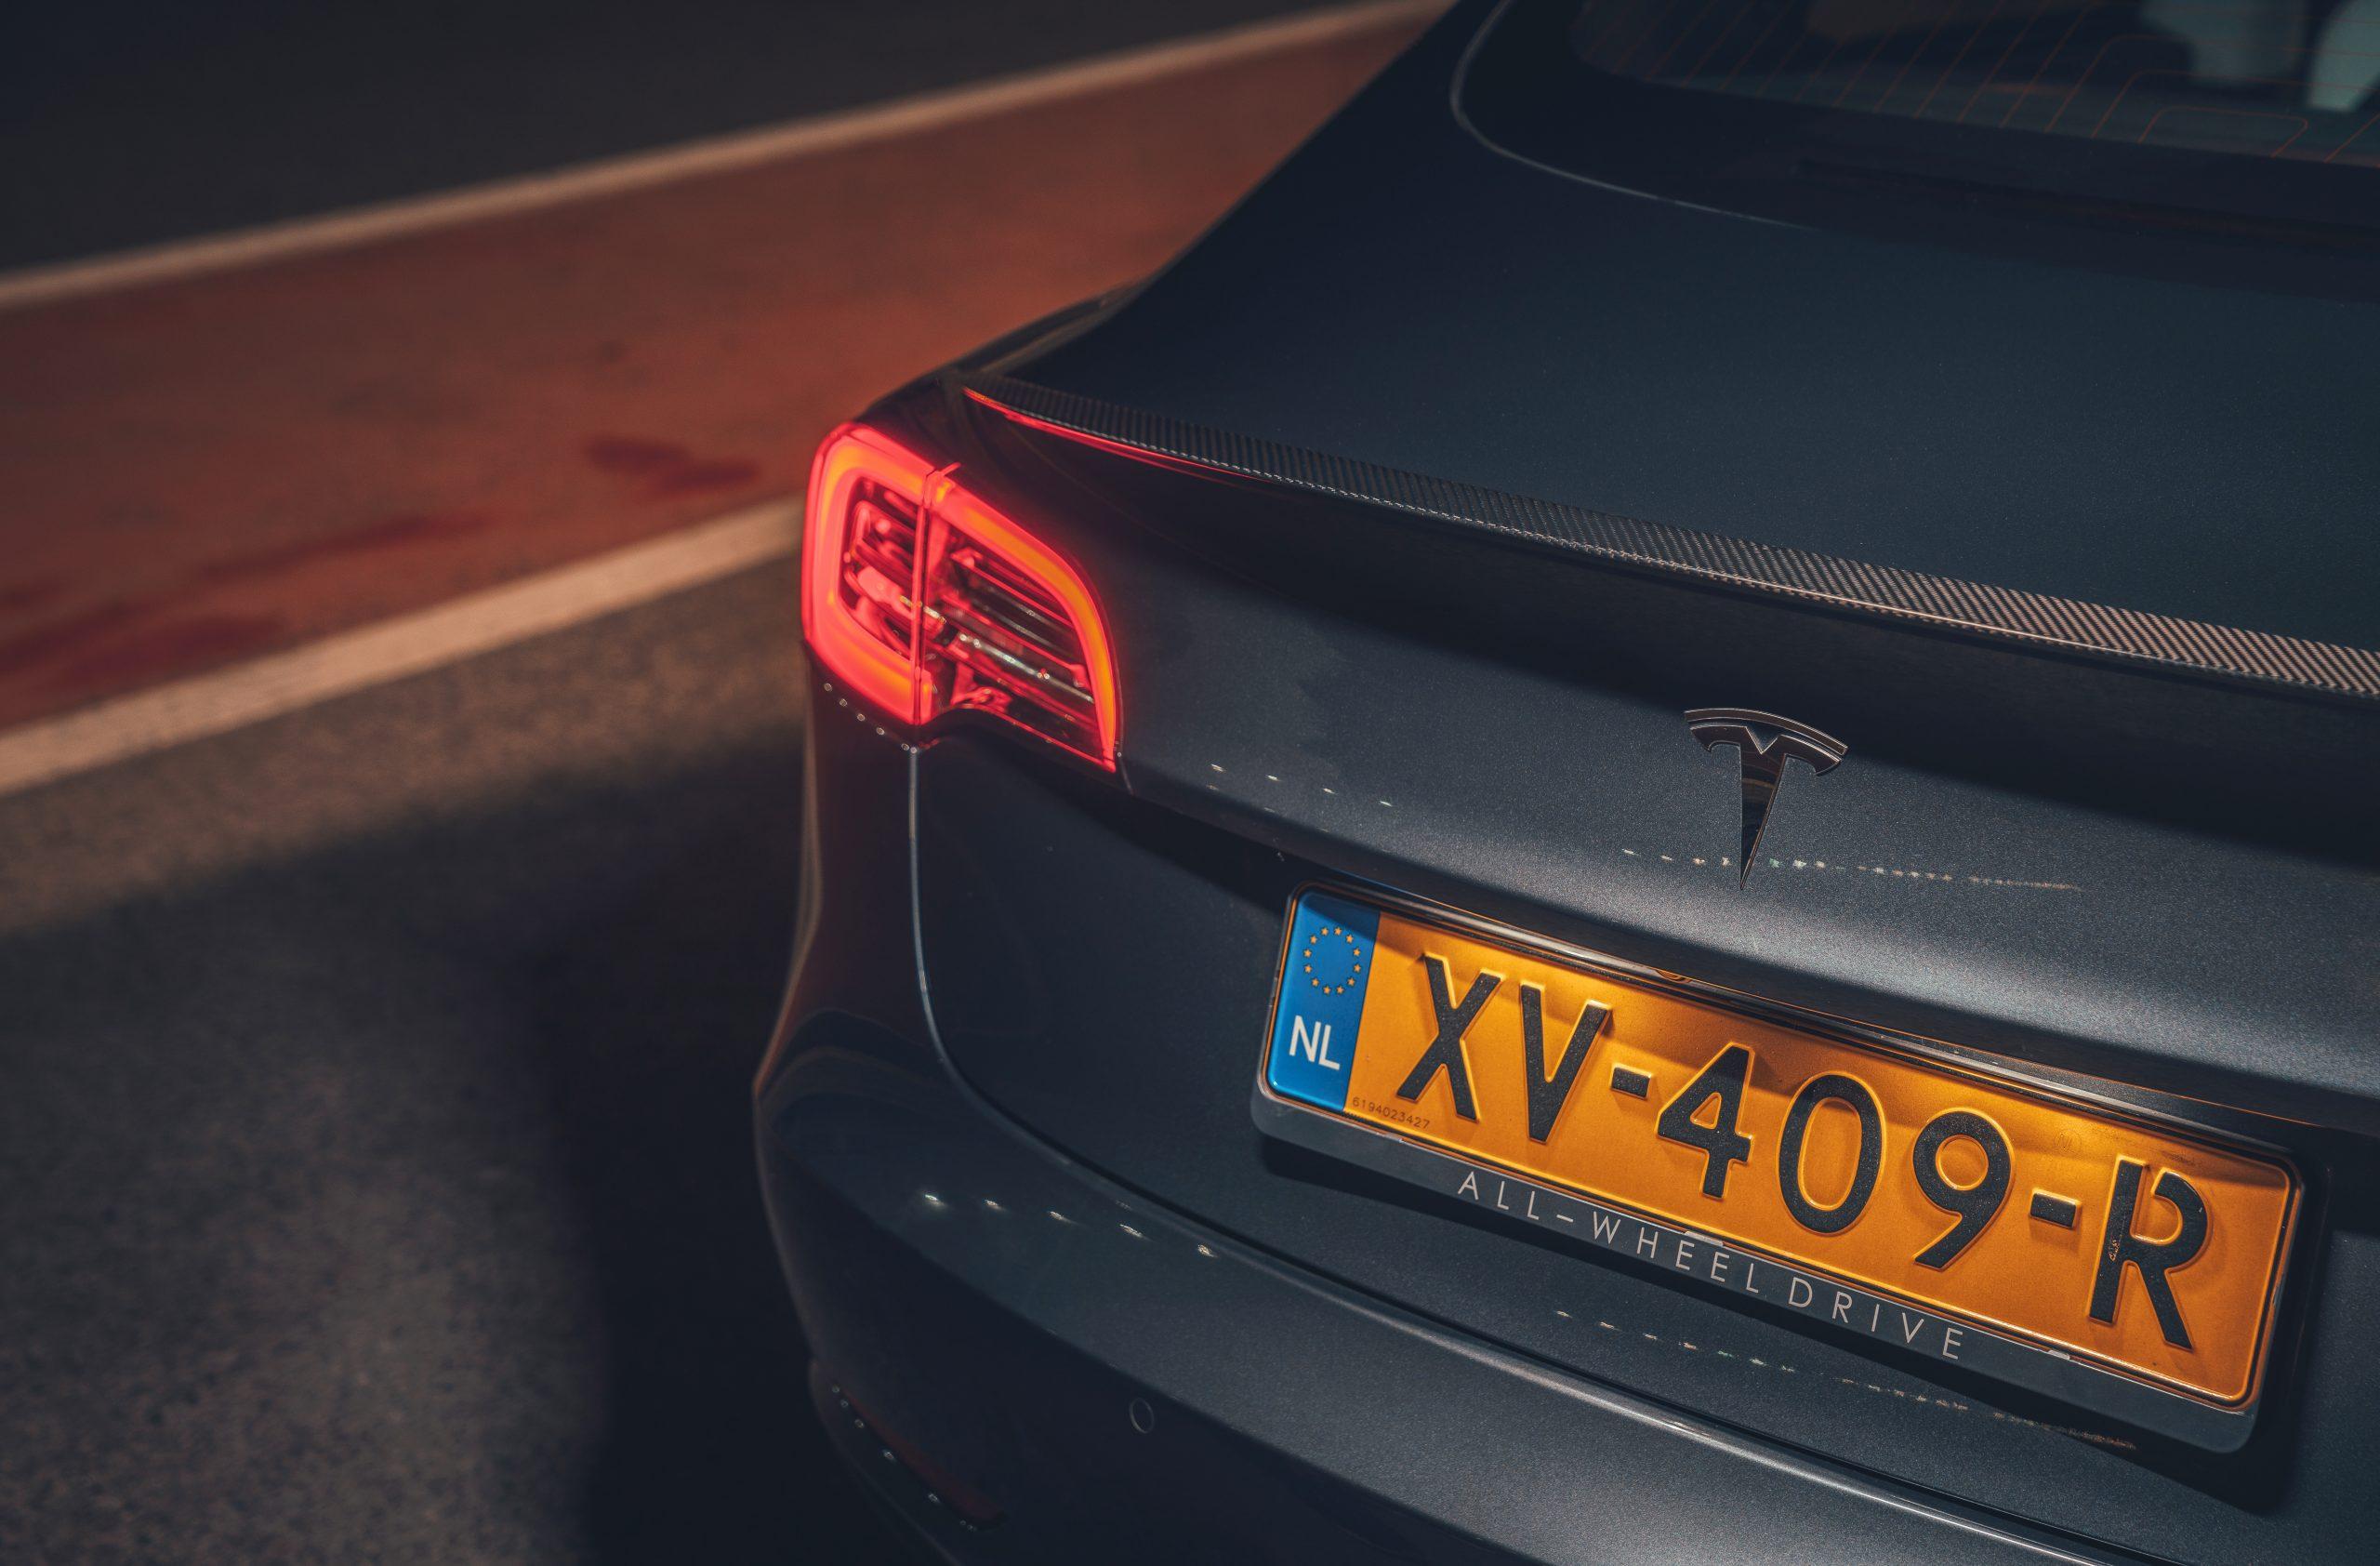 Tesla Model 3 Performance achterlicht en Nederlands kenteken